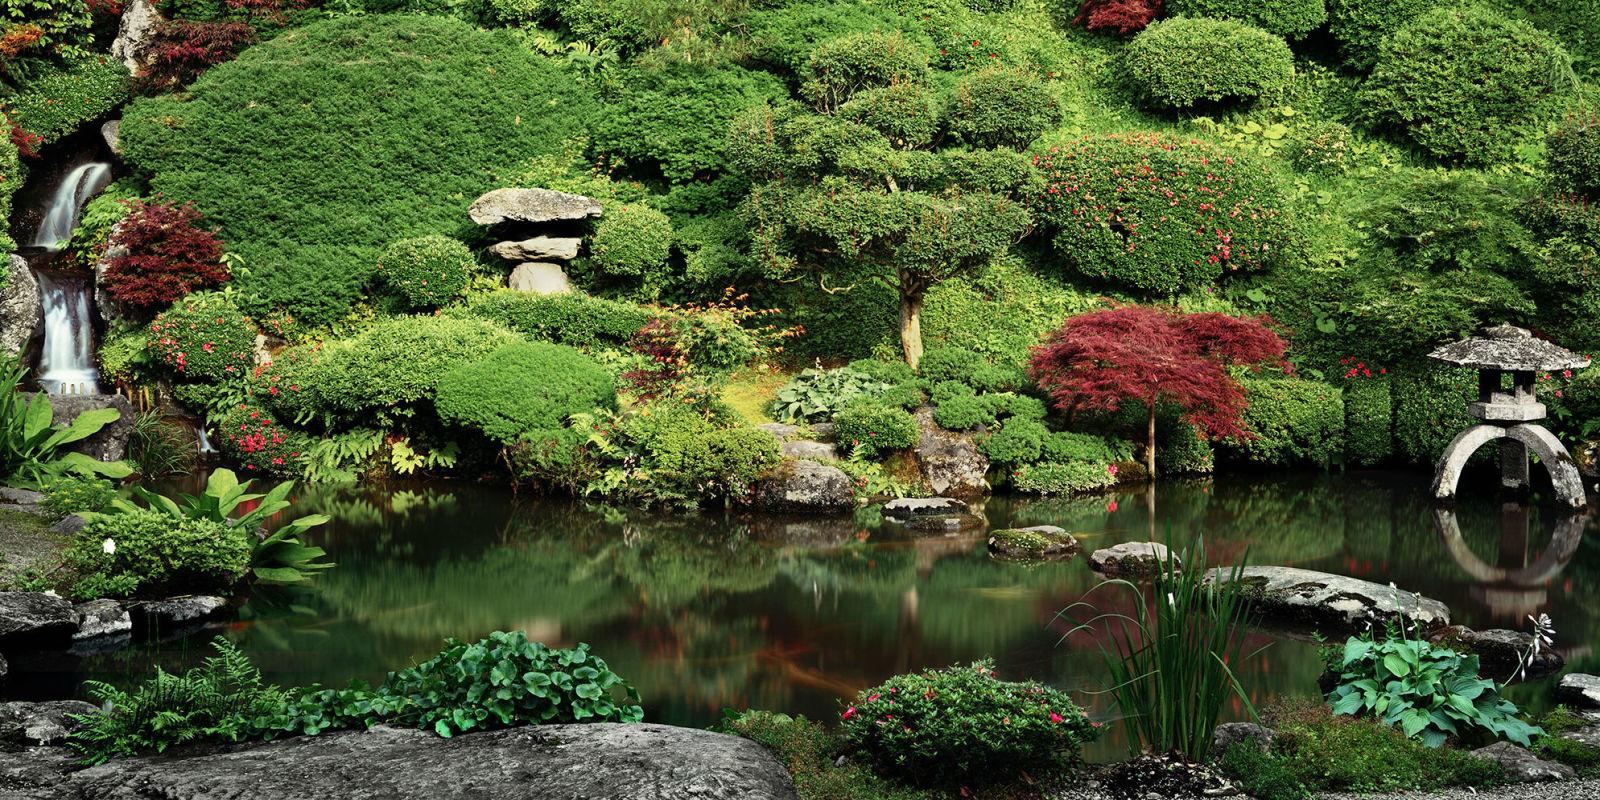 Giardino giapponese roma tutte le info for Giardini zen giapponesi